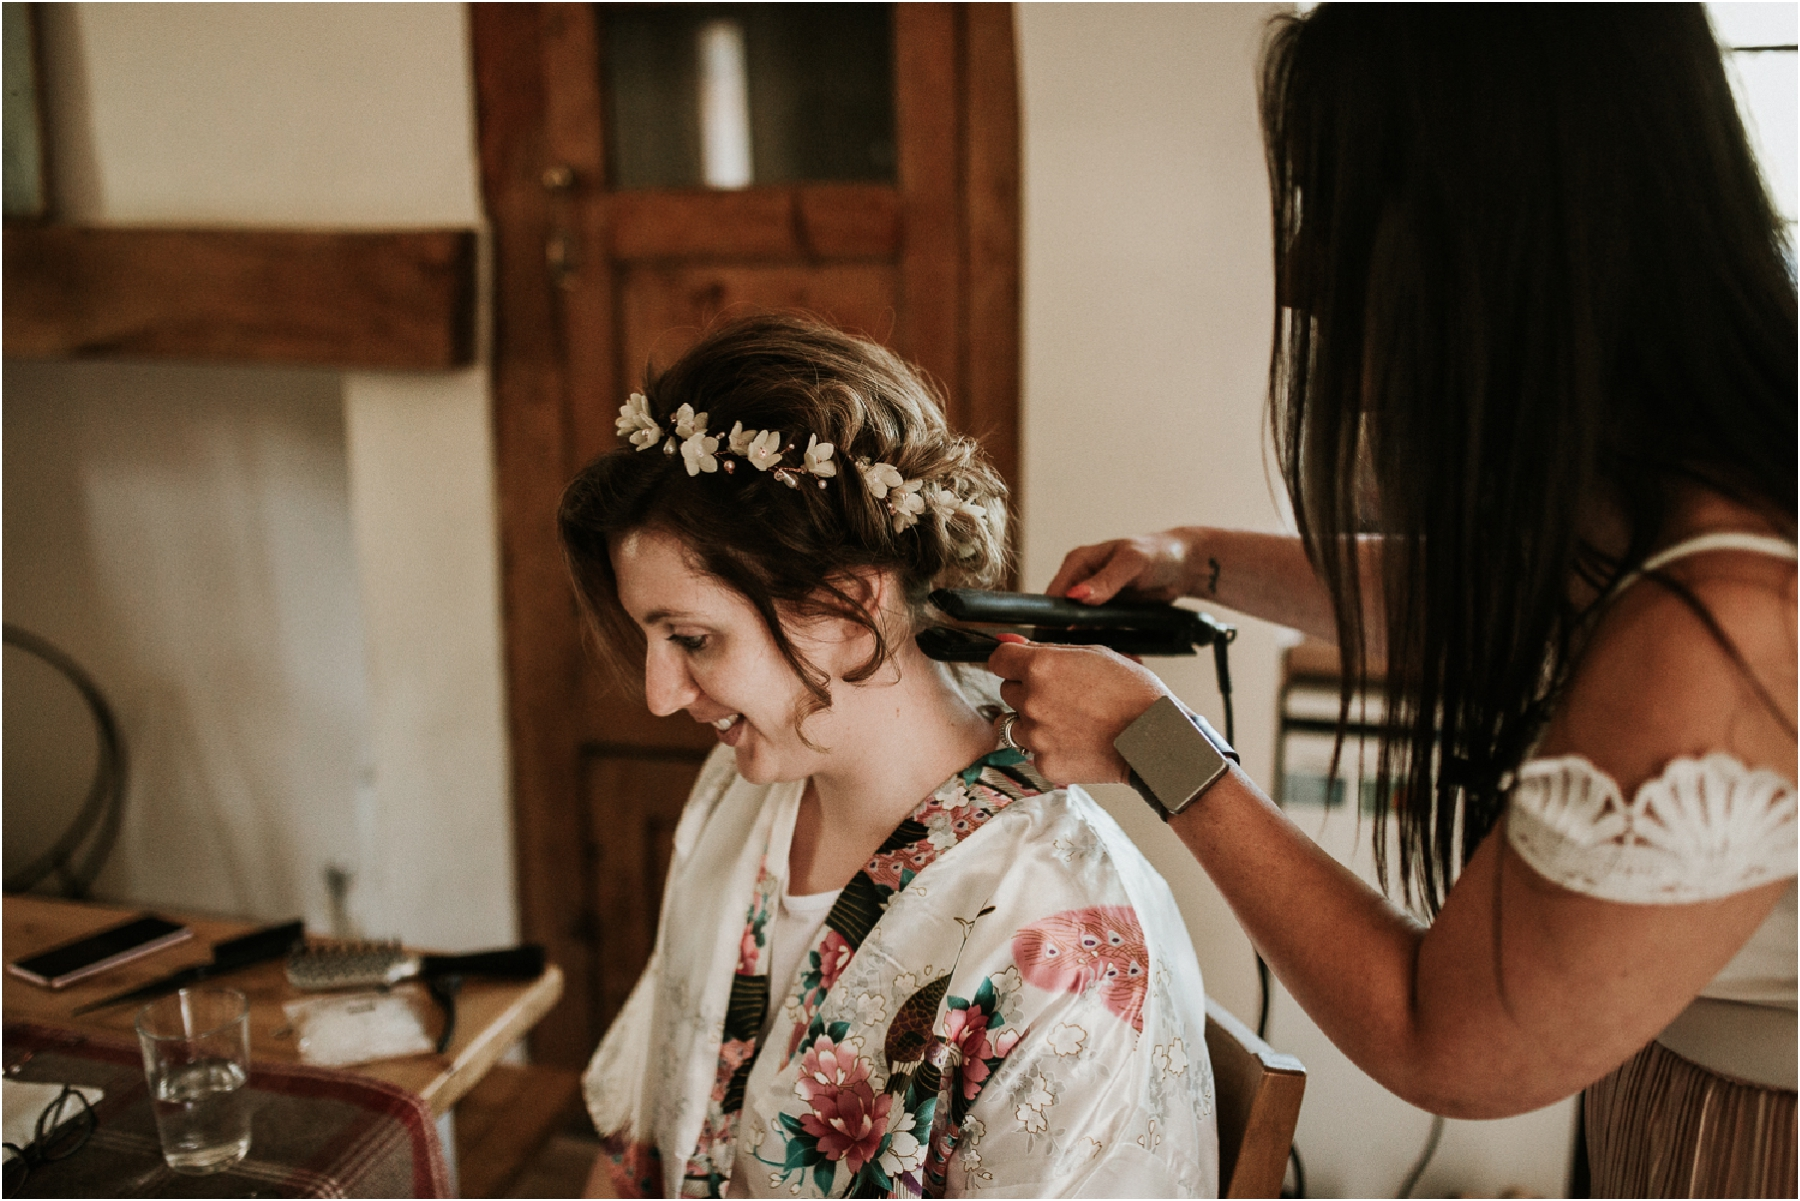 Herefordshire-uk-wedding-photographer_0023.jpg